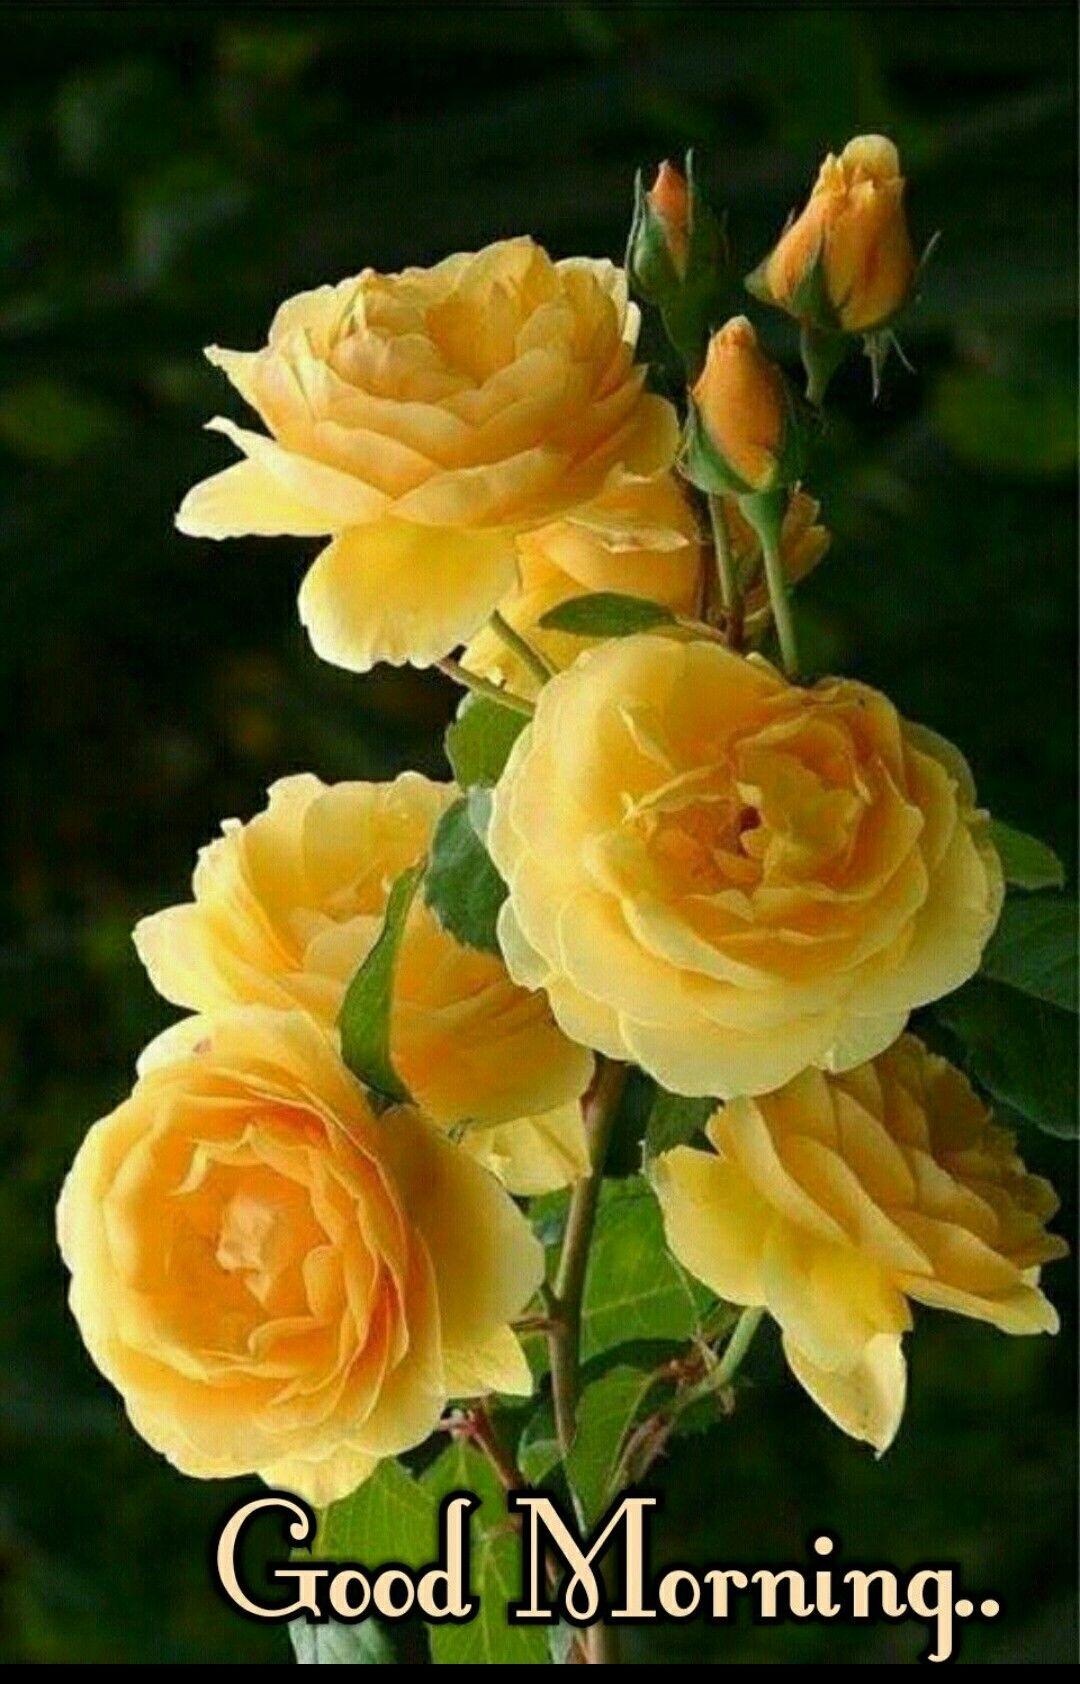 Good Morning Images With Yellow Rose Flowers Djiwallpaper